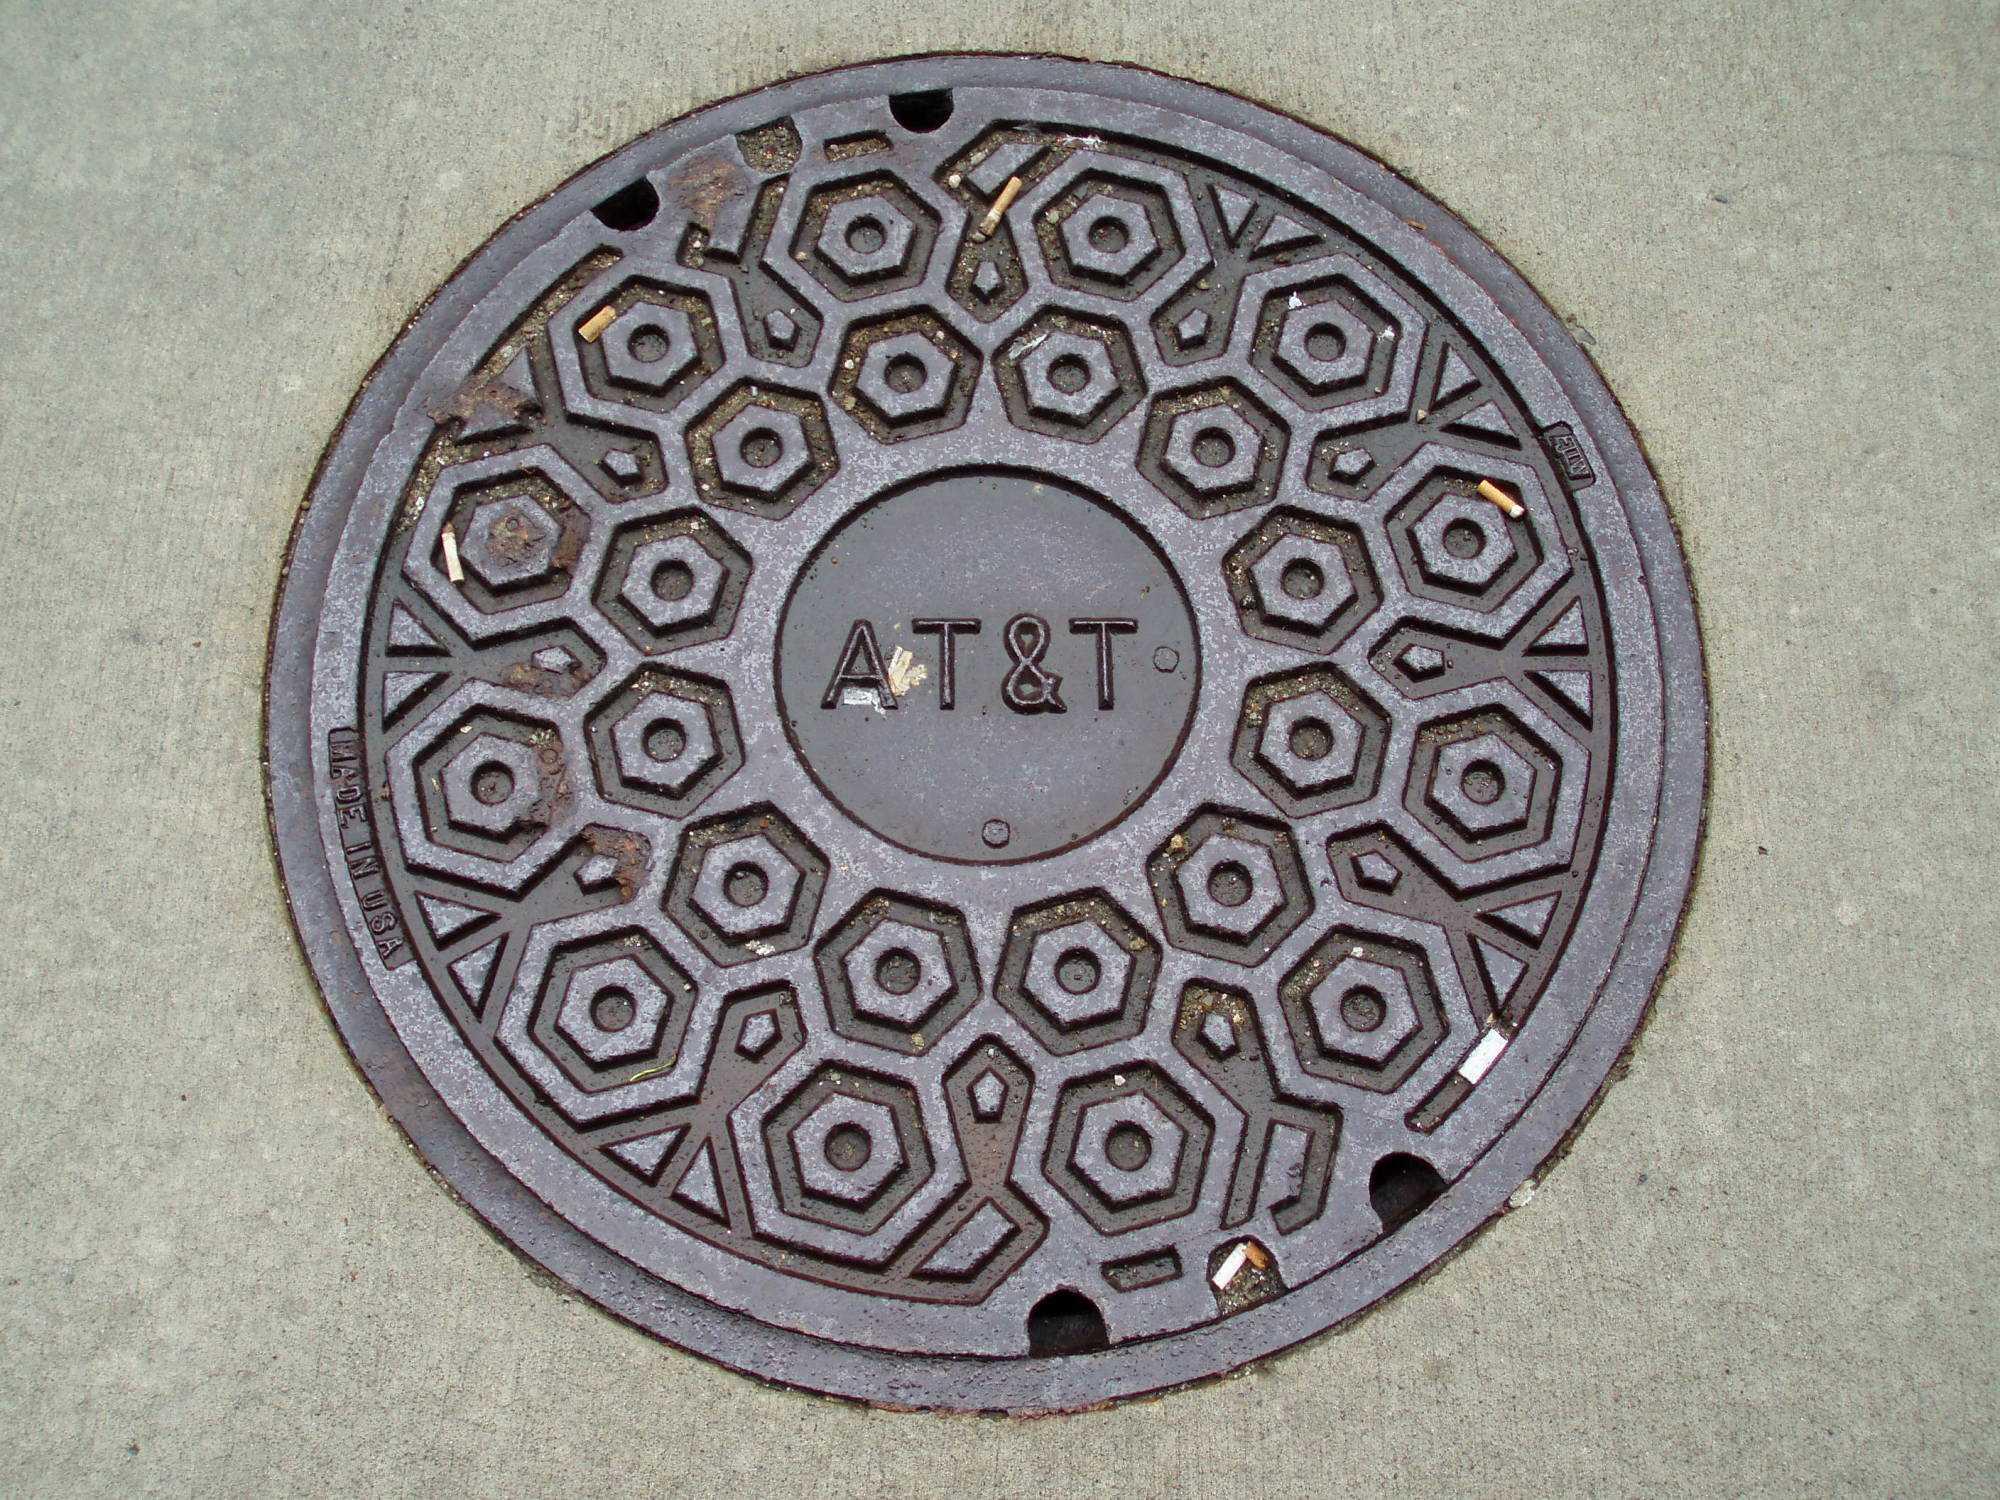 Gusseieserner Schachtdeckel mit Aufschrift AT&T